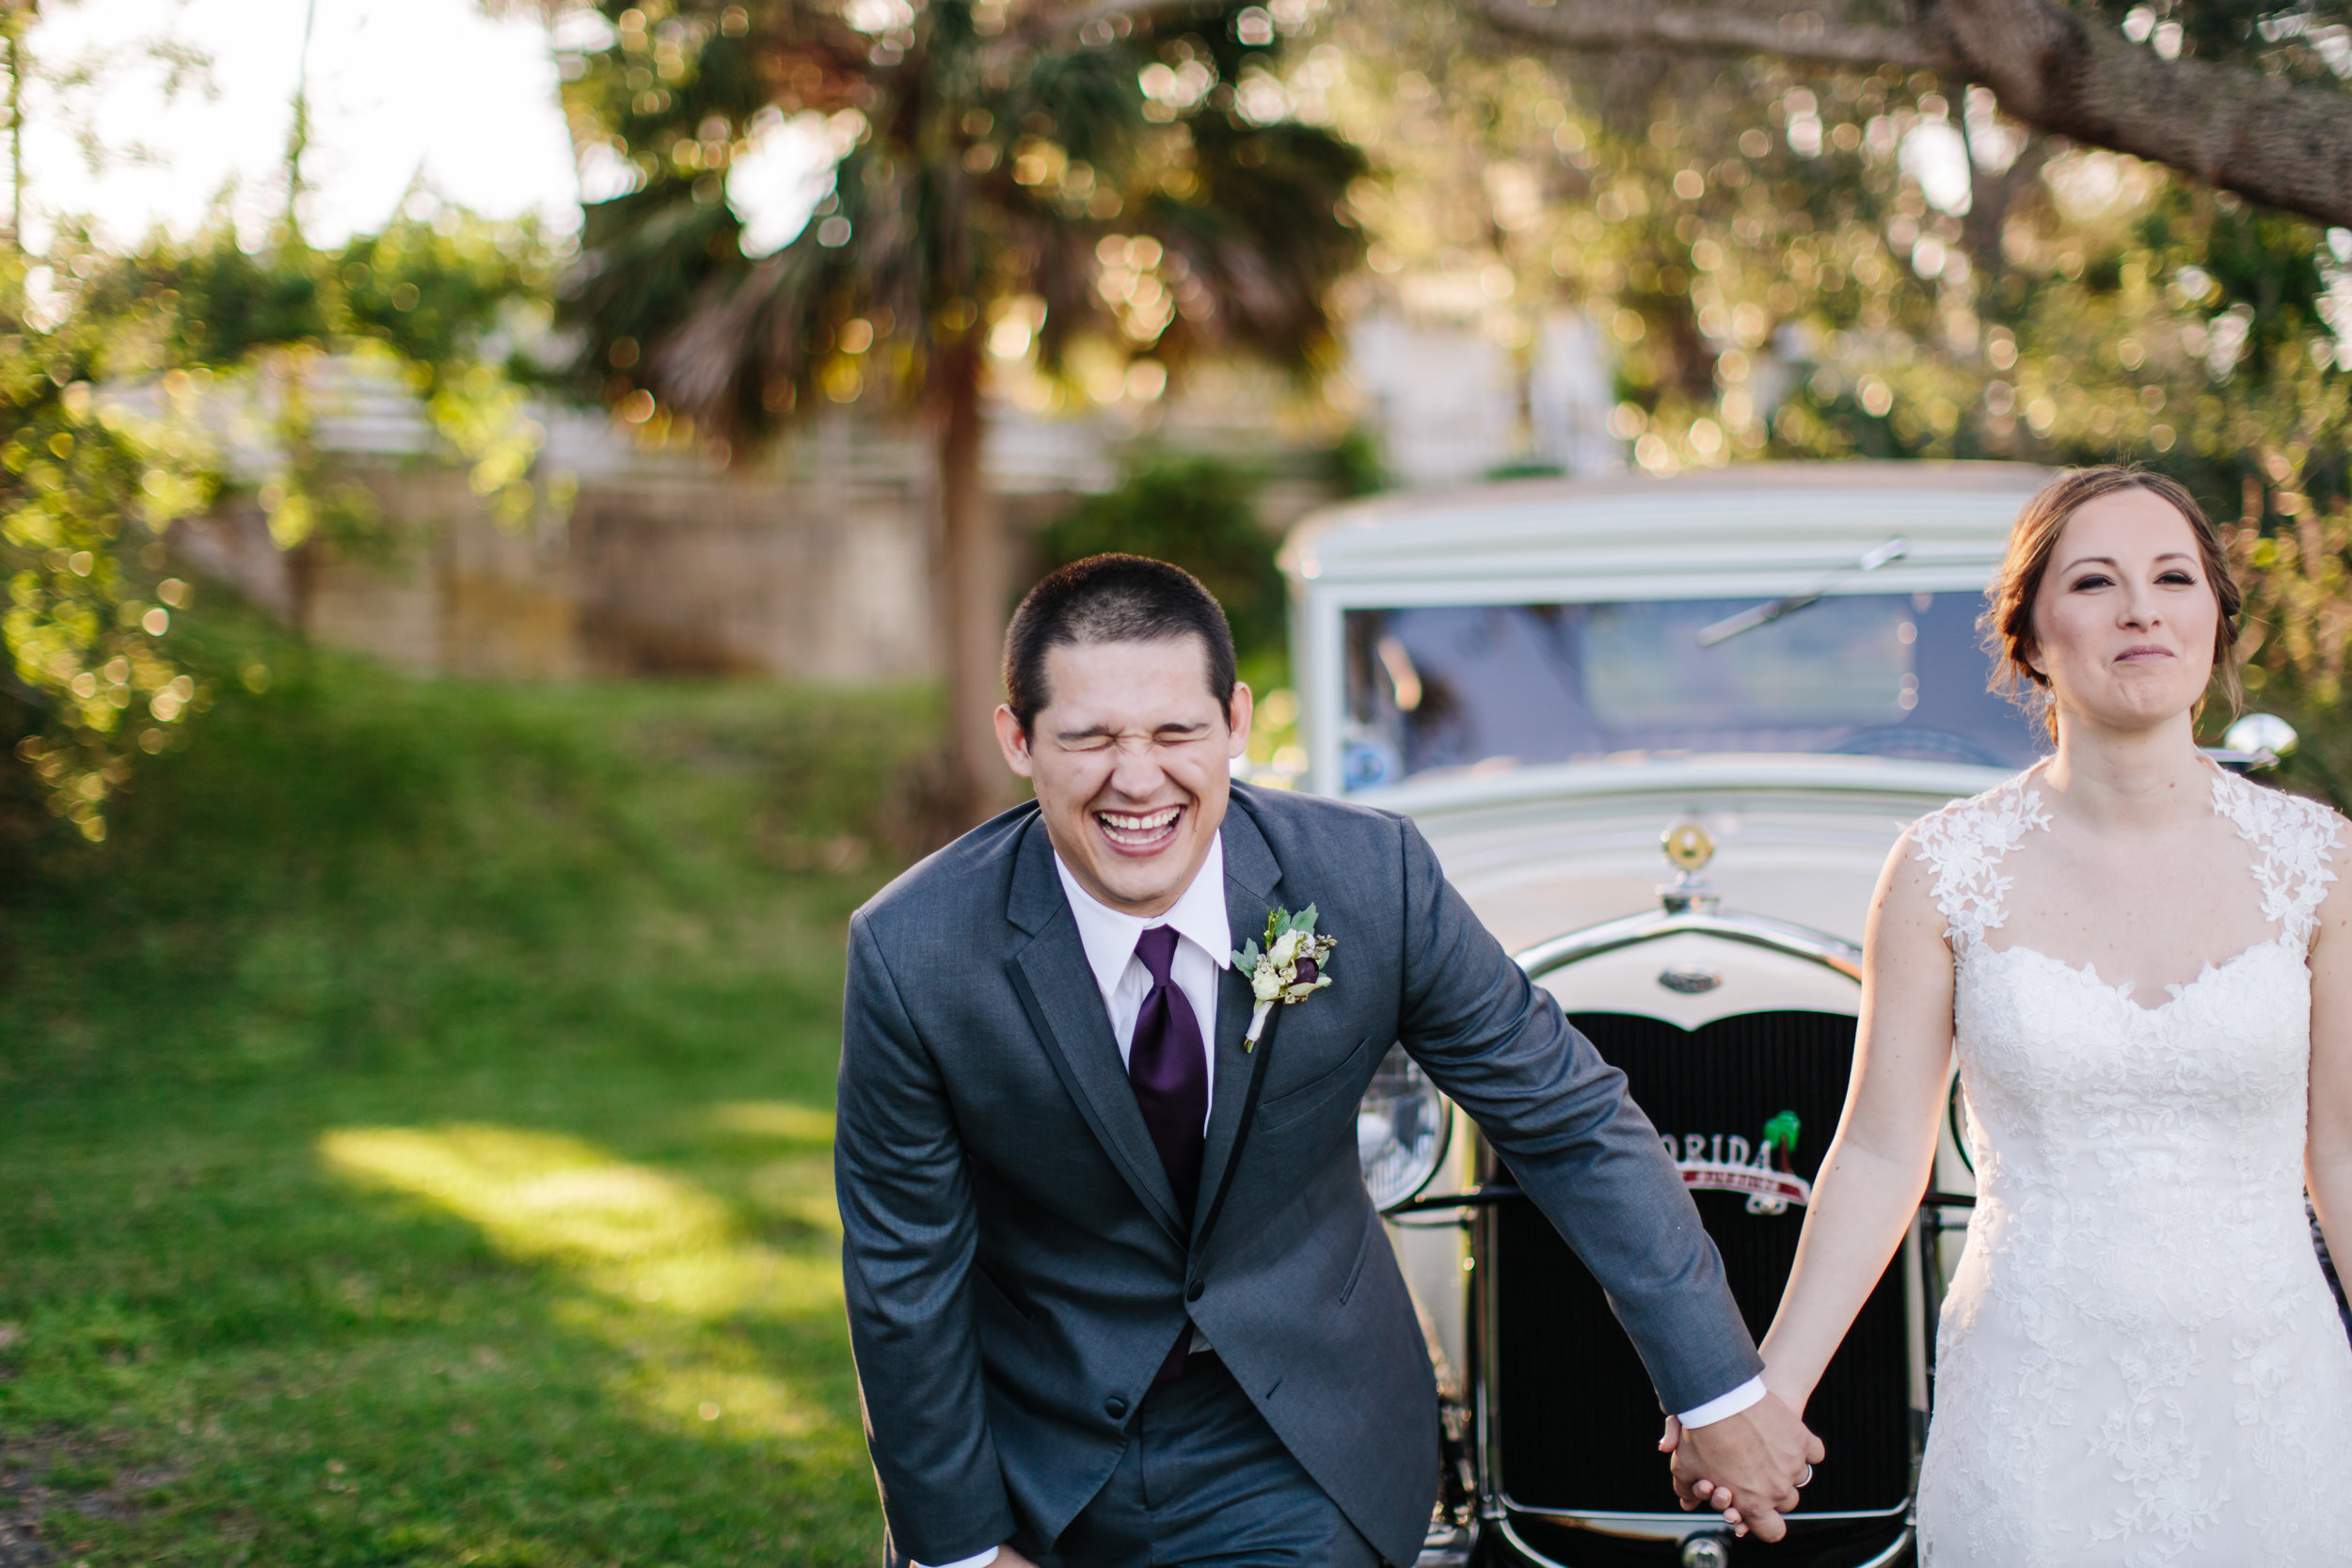 2018.02.17 Whitney and Joe Meyer Melbourne Wedding (411 of 759).jpg